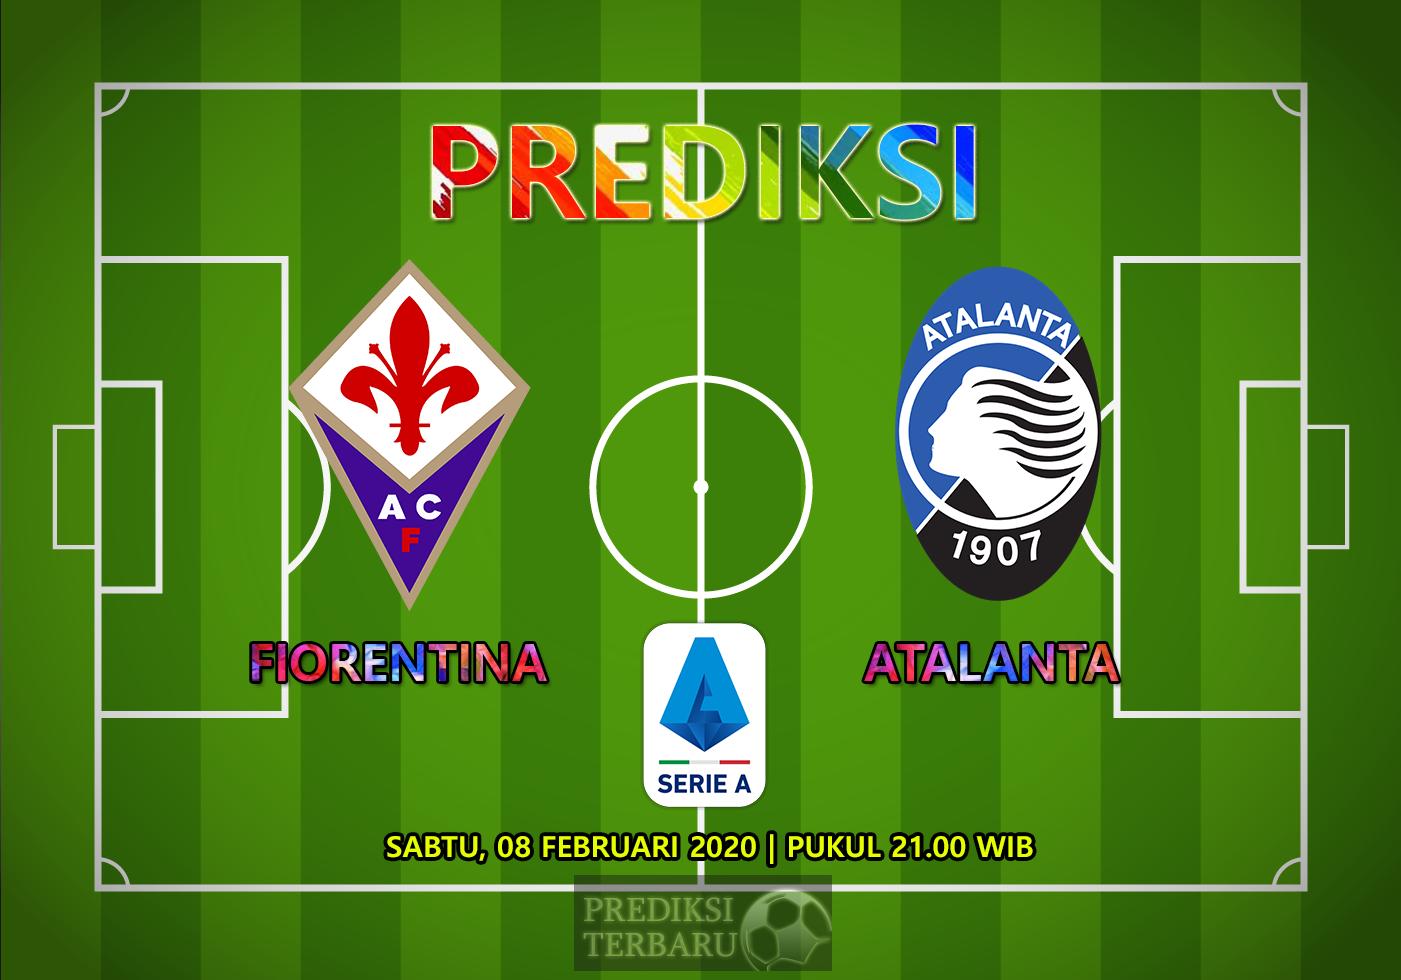 Prediksi Fiorentina Vs Atalanta 08 Februari